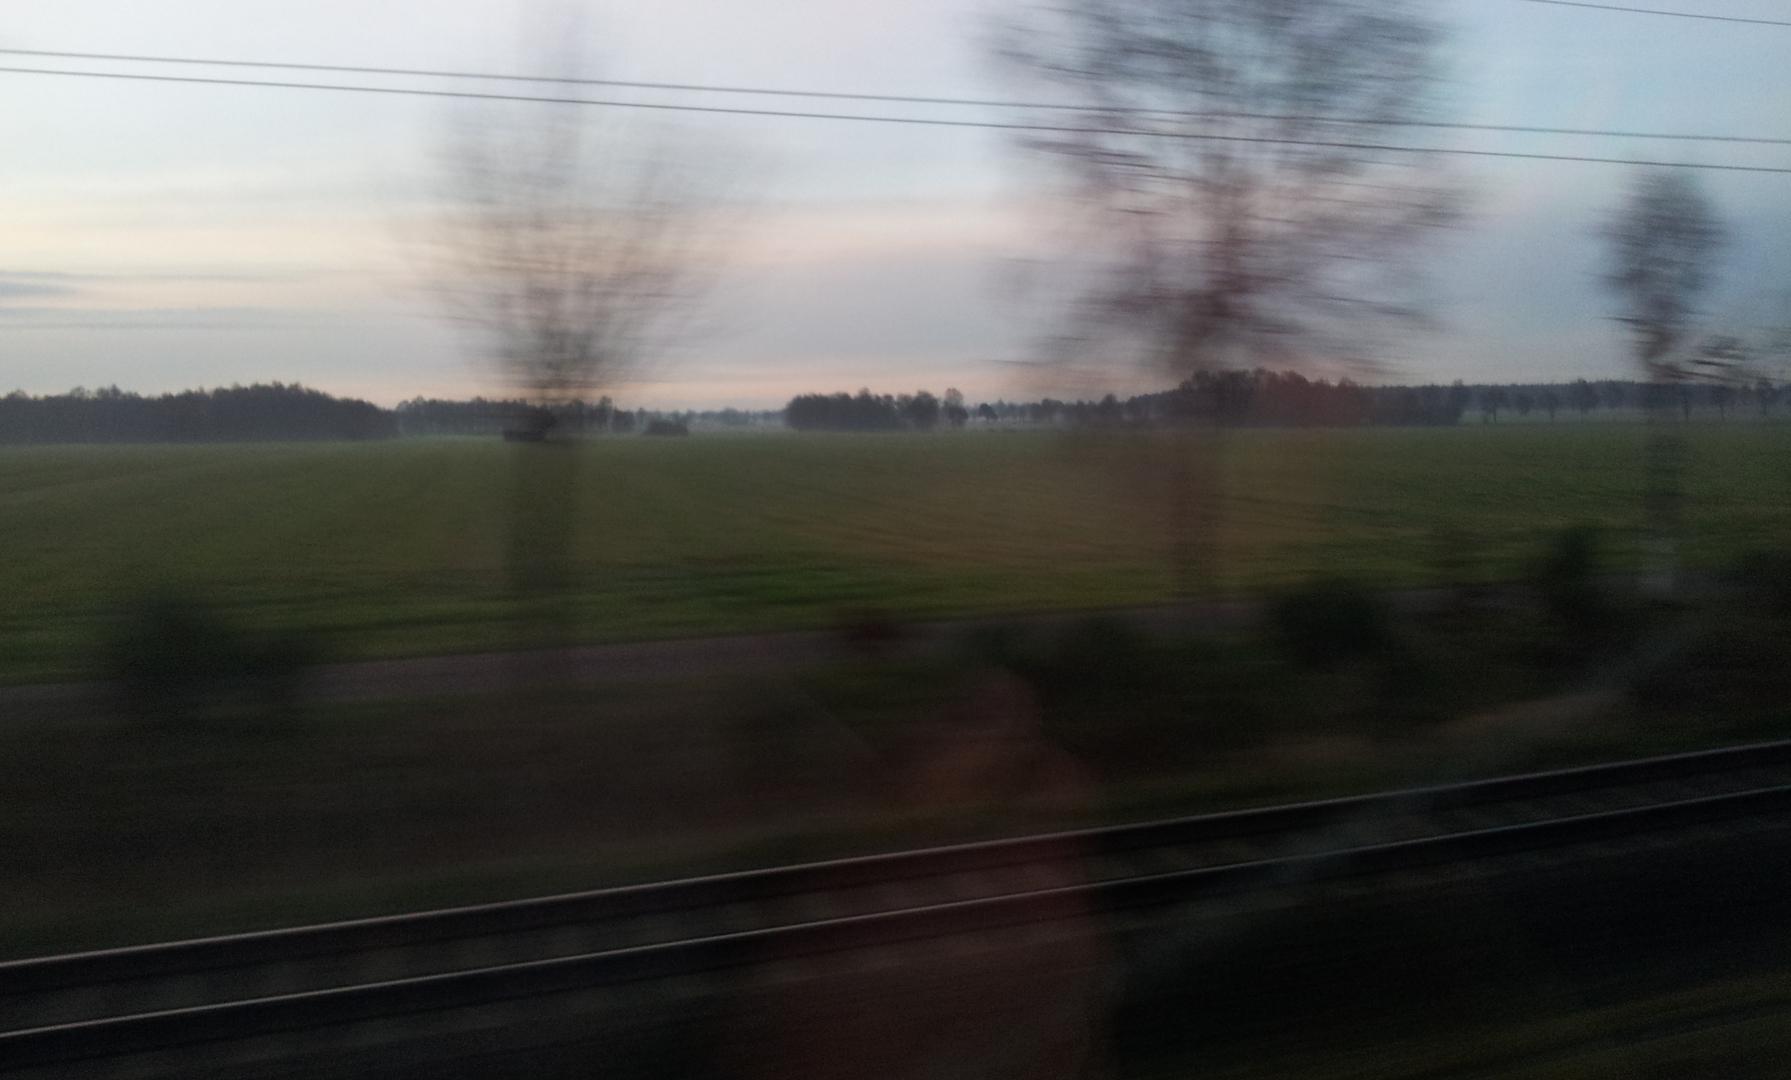 Vorbeifliegende Landschaften